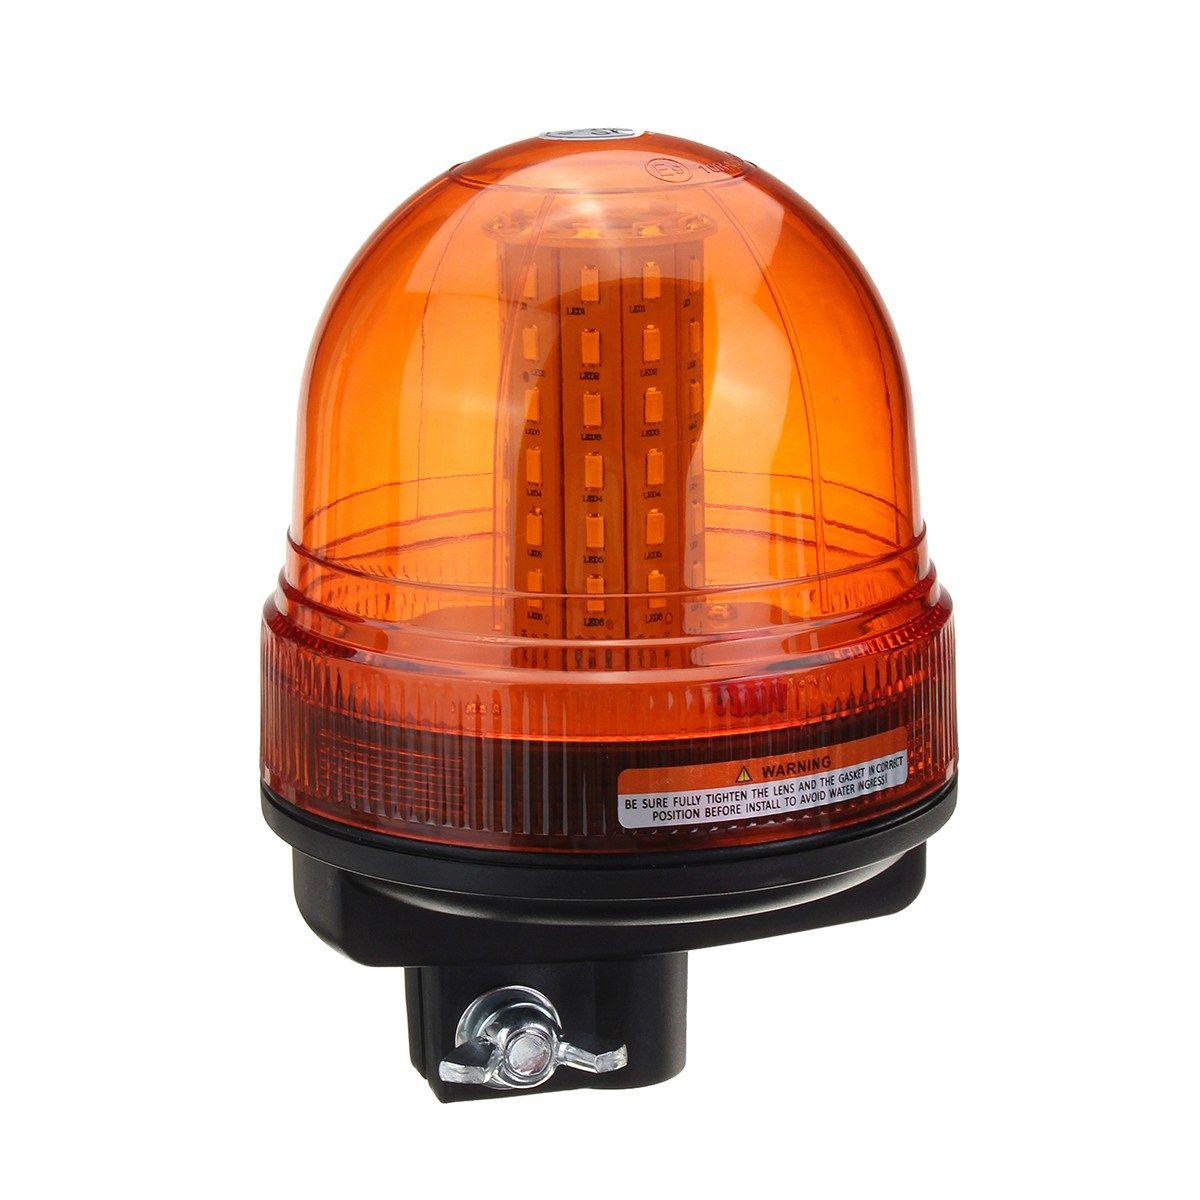 NEW Safurance 60 LED Rotating Flashing Amber Beacon Flexible Tractor Warning Light Traffic Light Roadway Safety